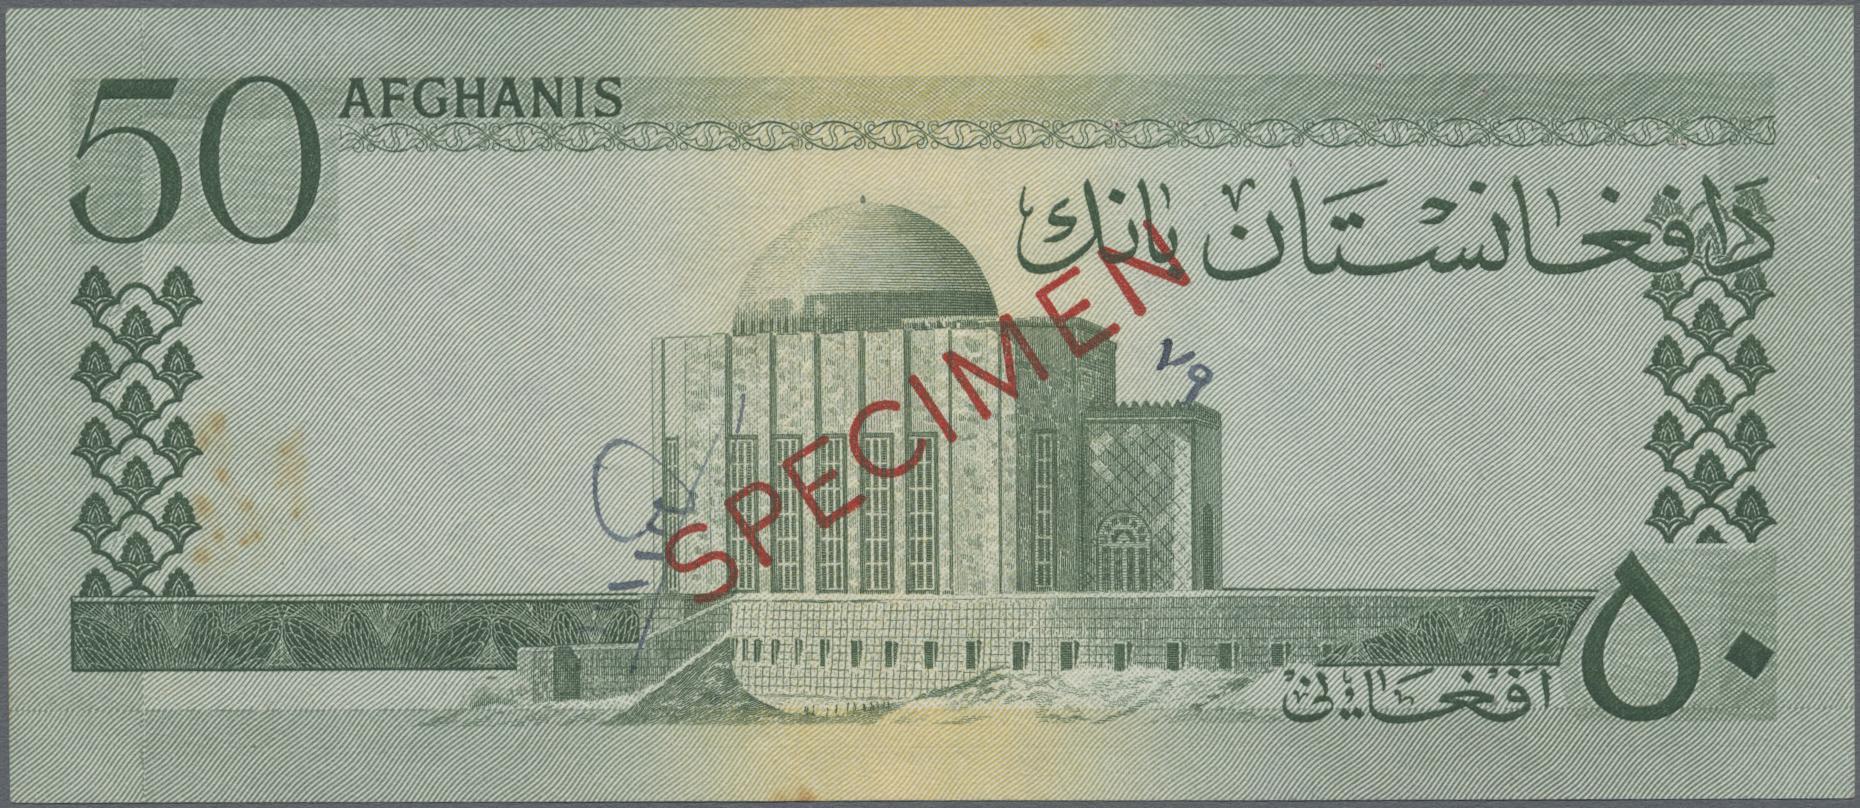 Lot 00004 - Afghanistan | Banknoten  -  Auktionshaus Christoph Gärtner GmbH & Co. KG Sale #48 The Banknotes